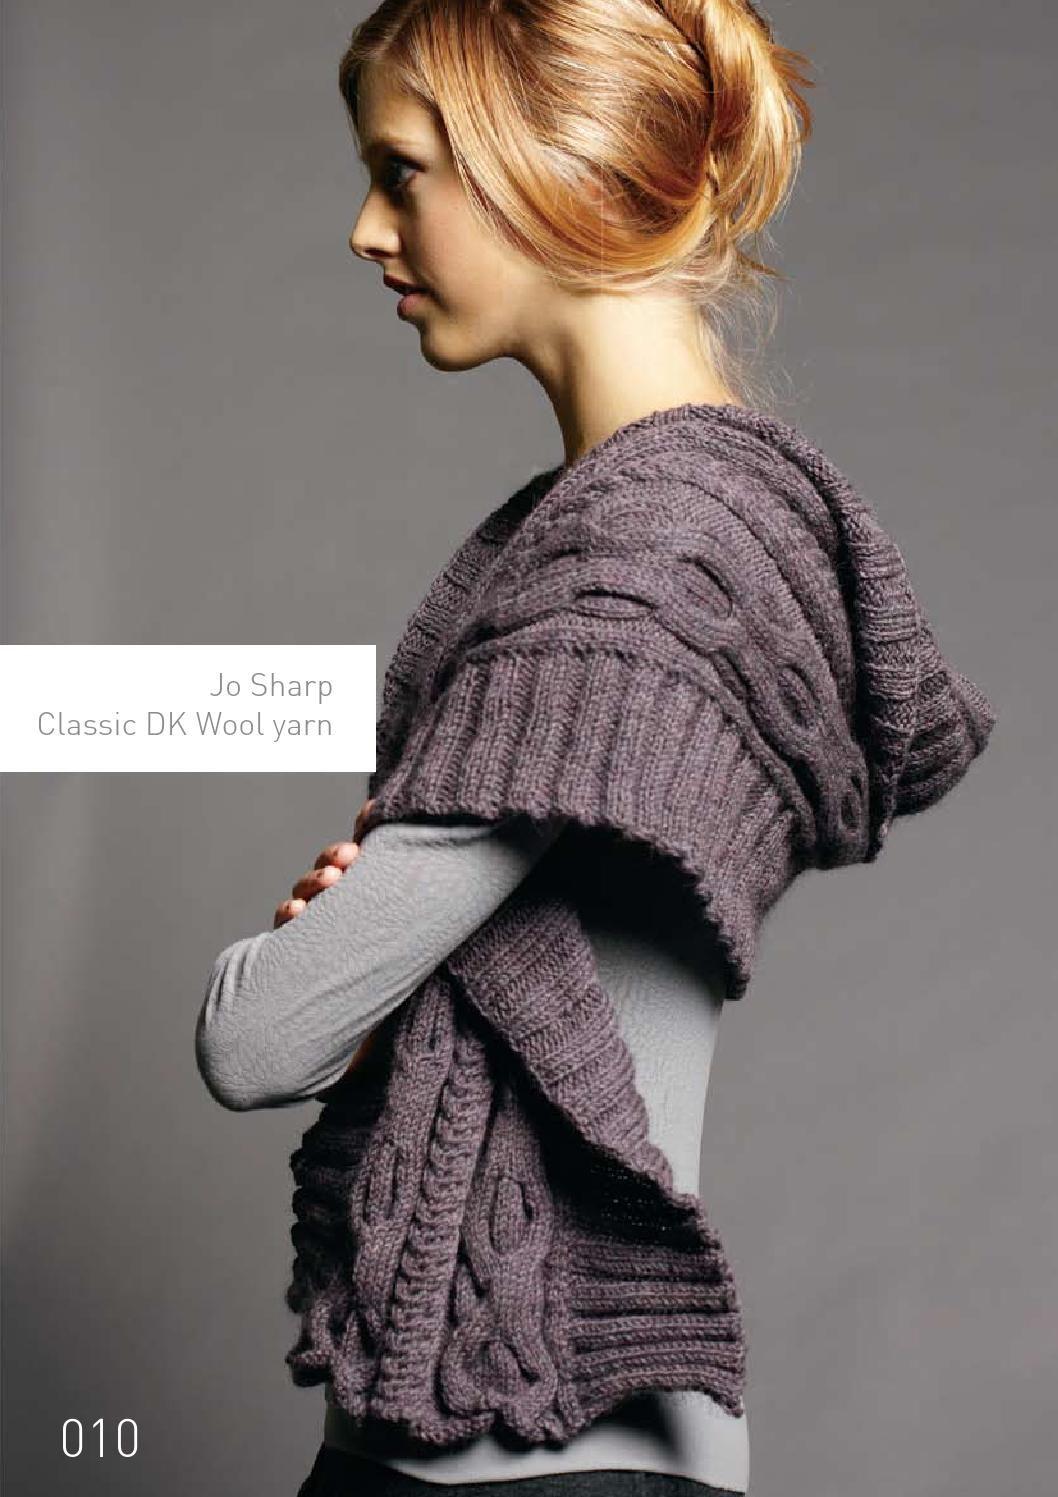 2014 Jo Sharp hand knitting yarn catalogue   Yarns, Catalog and Crochet